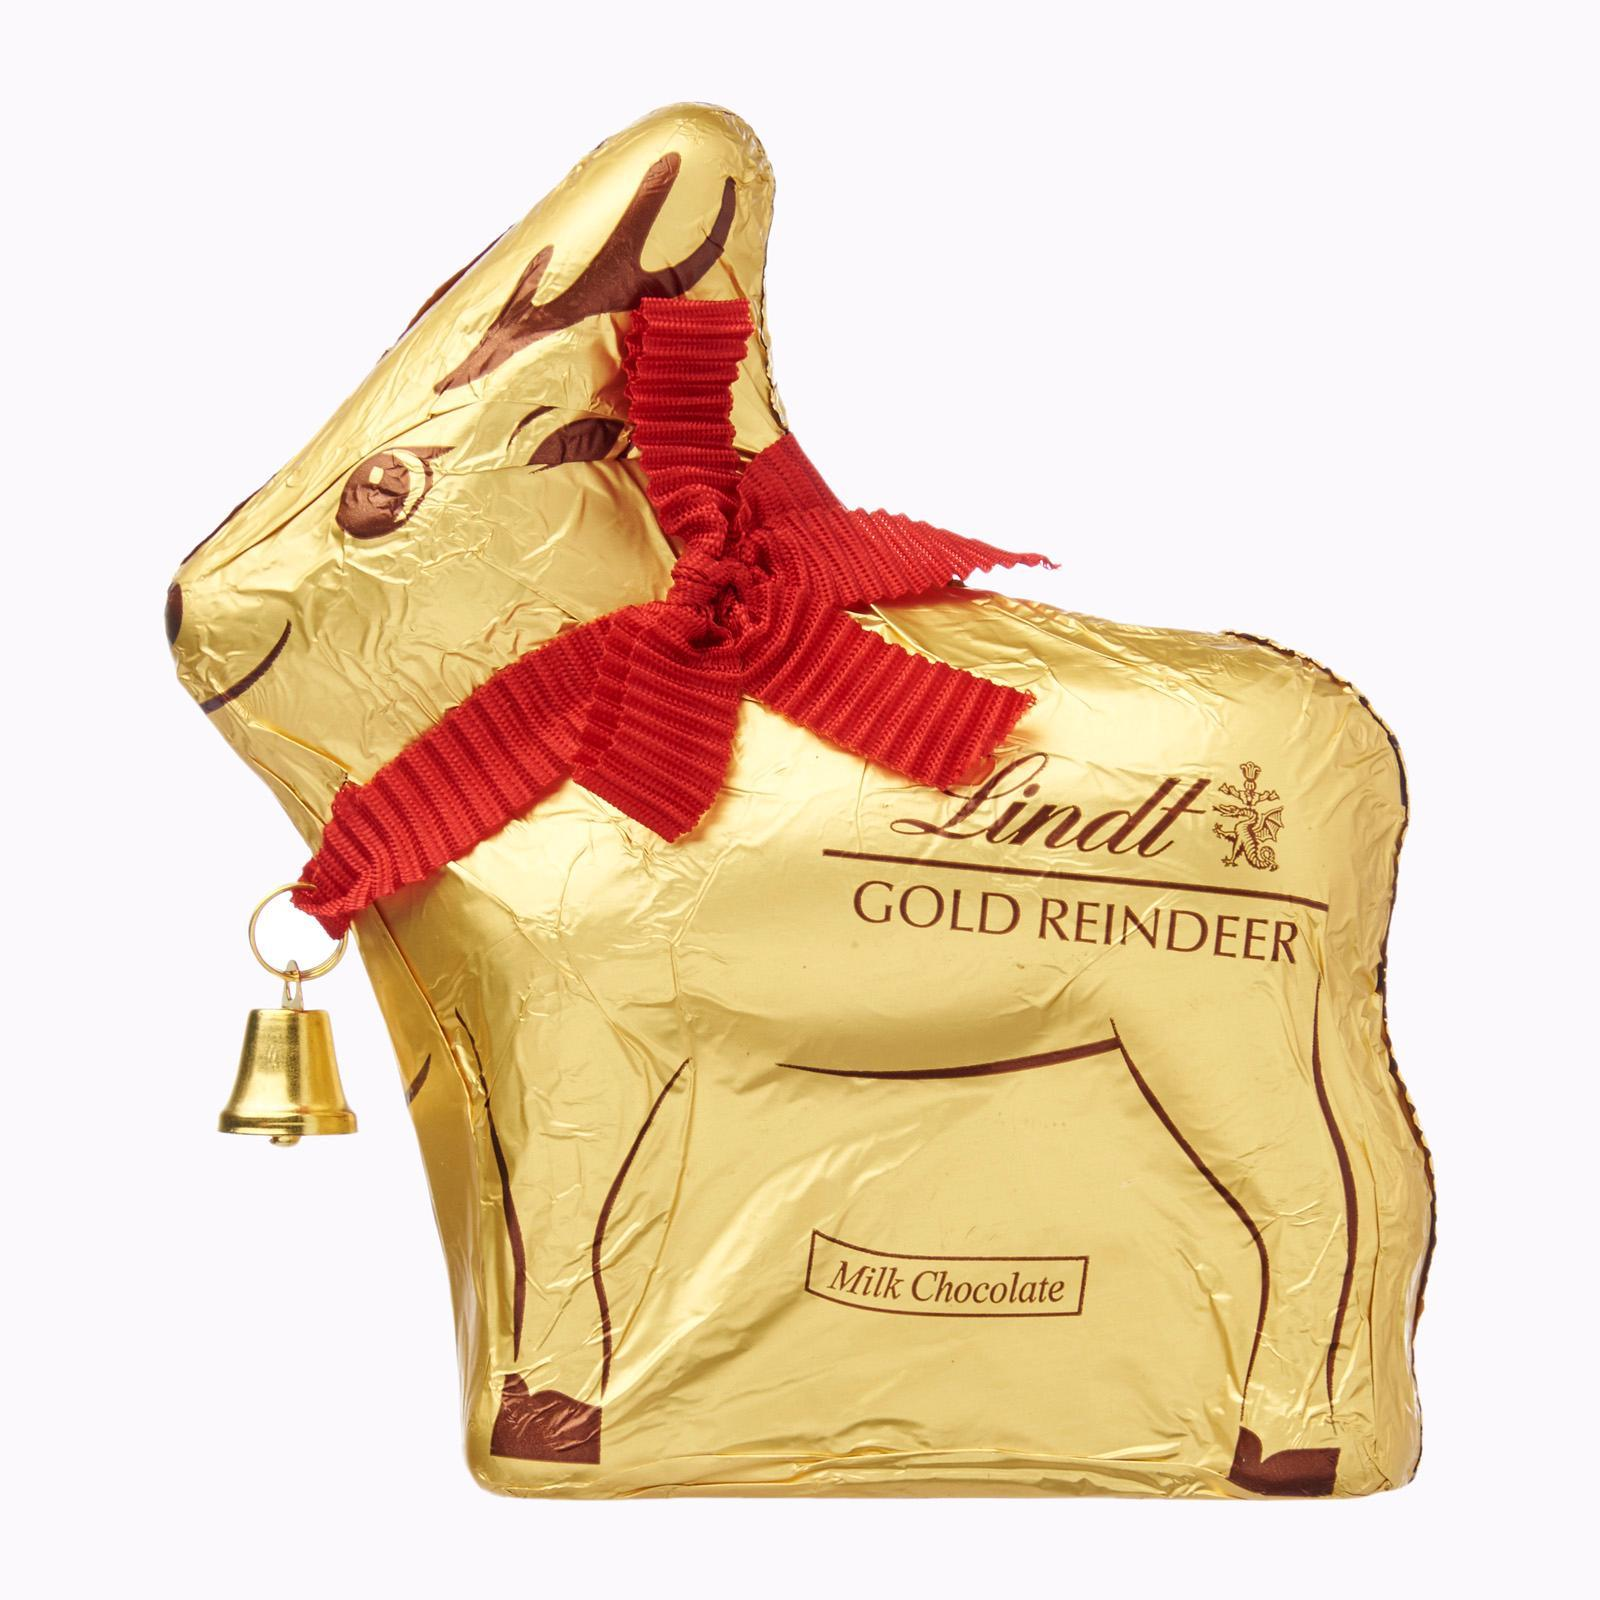 Lindt Milk Chocolate Reindeer - Christmas Special